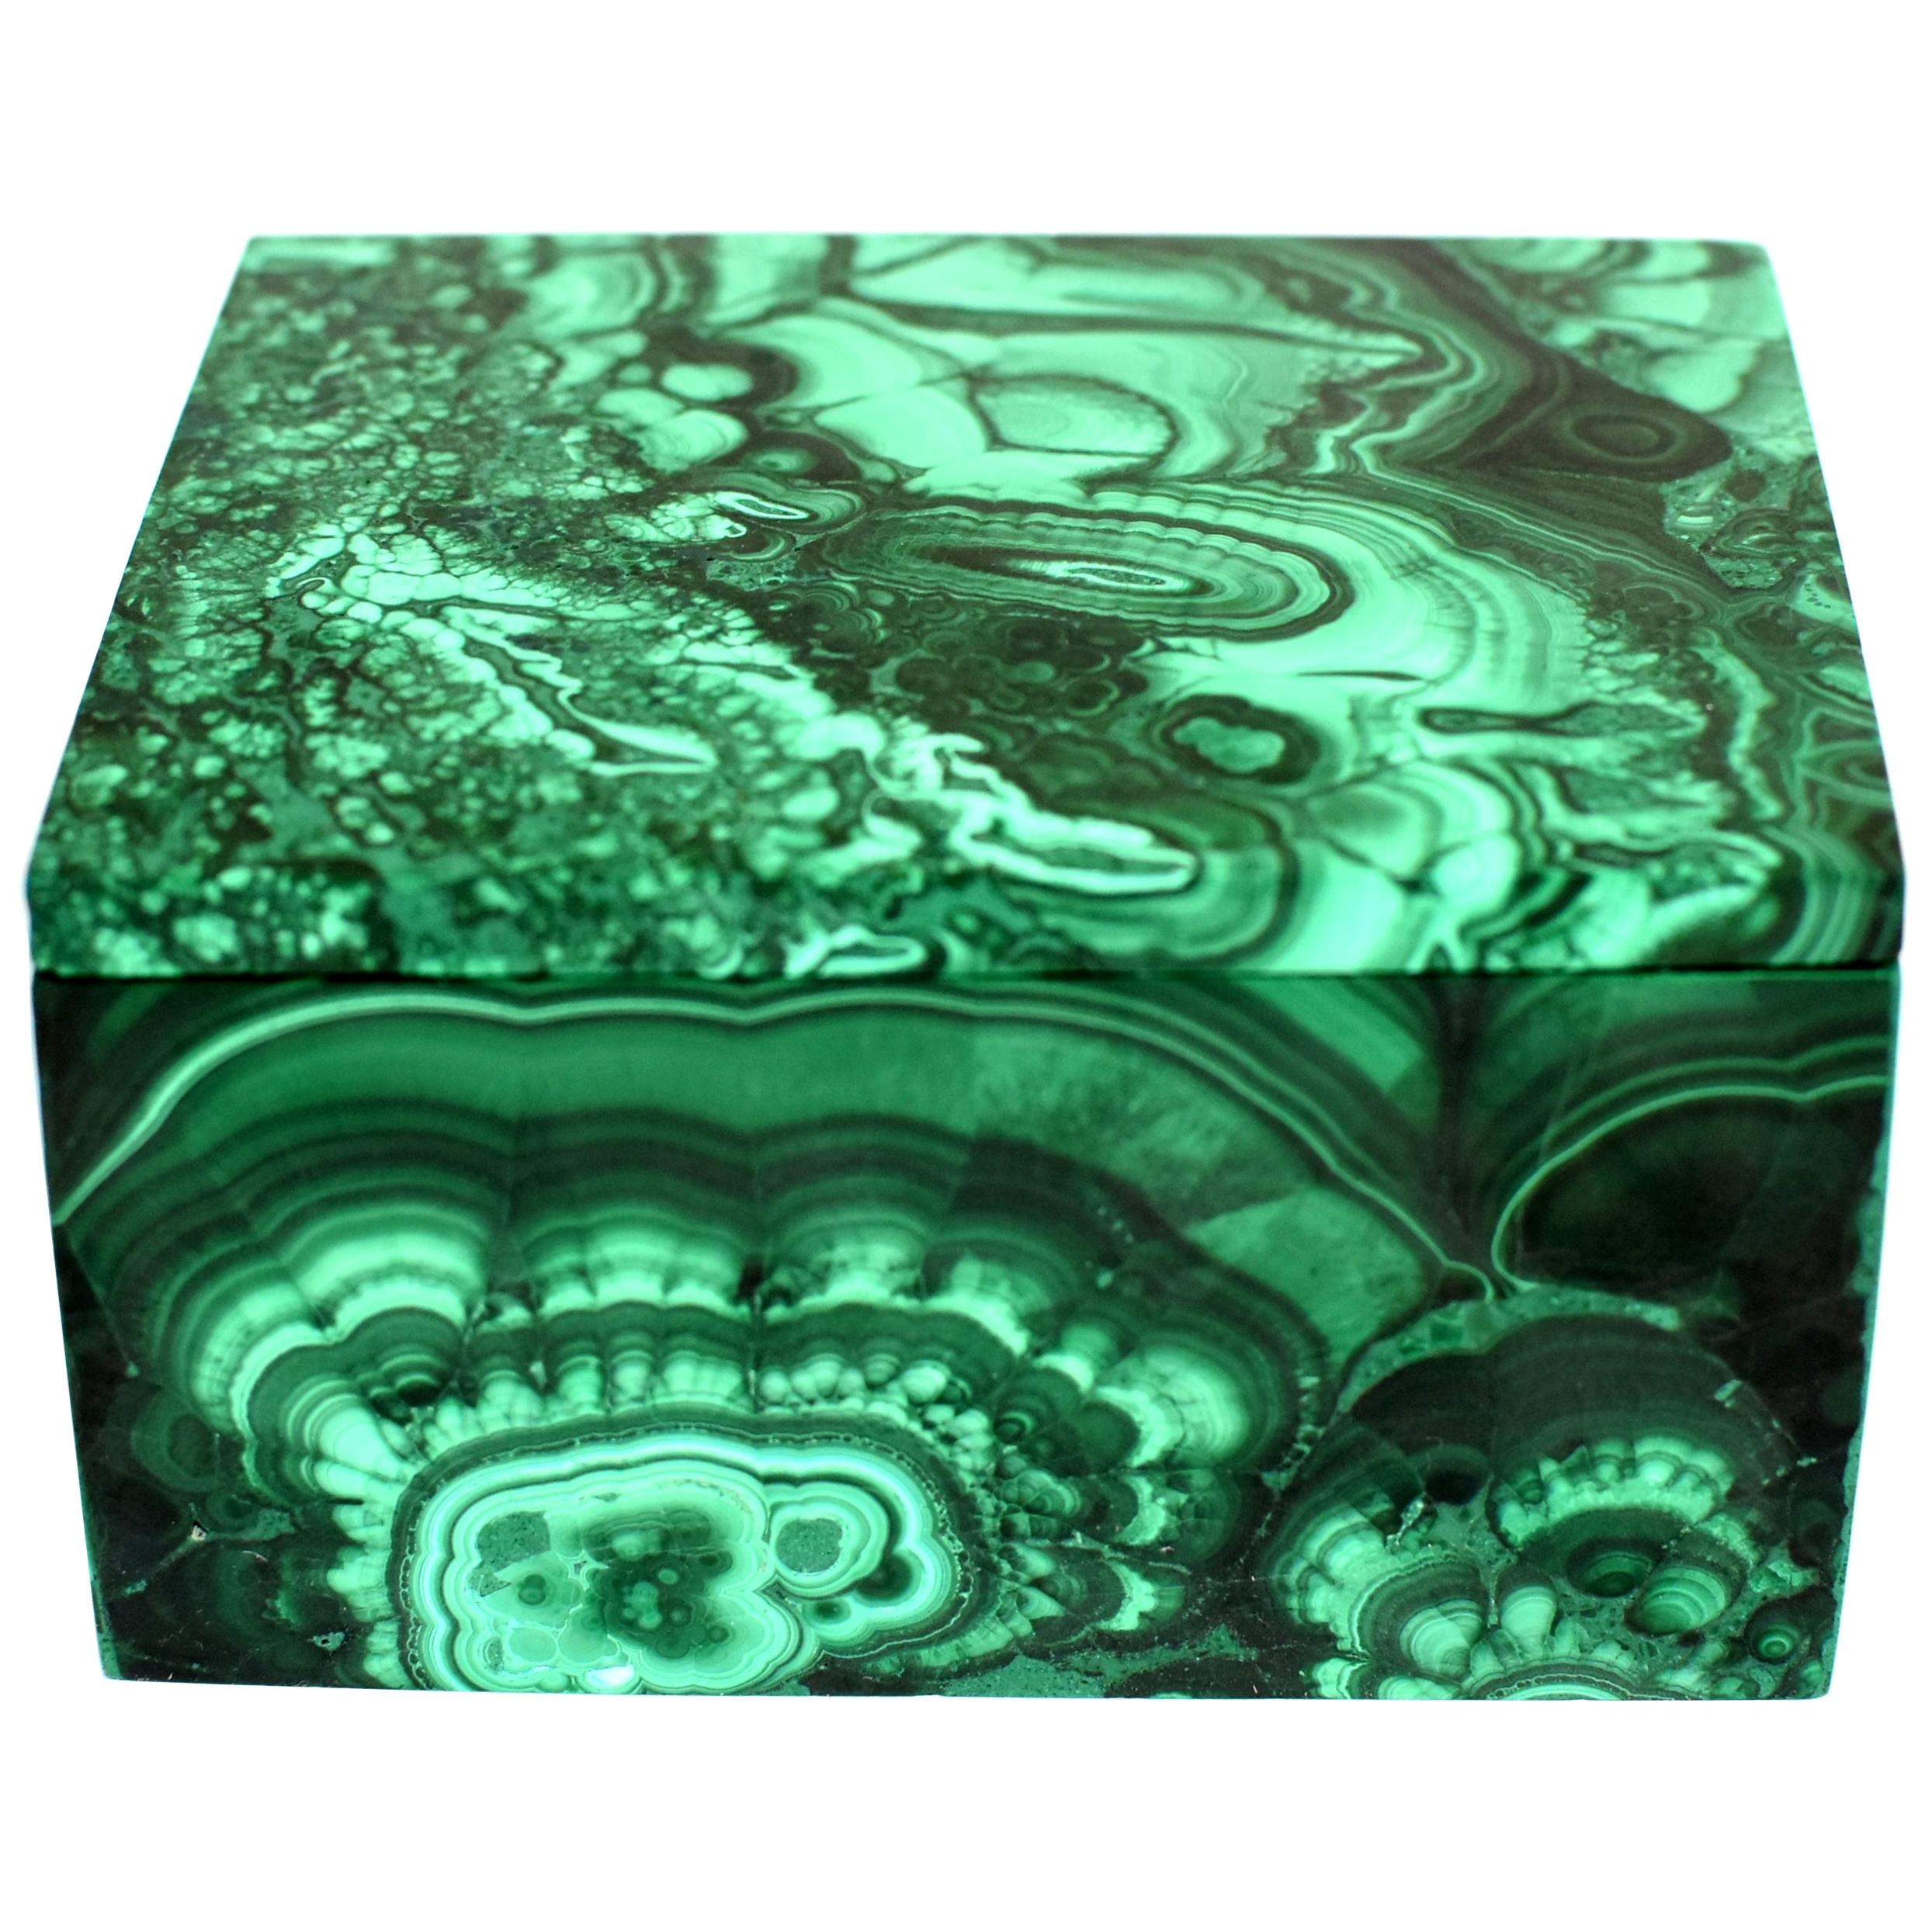 Natural Malachite Box 1.4 Lb Full Slab Gemstone Jewelry Box